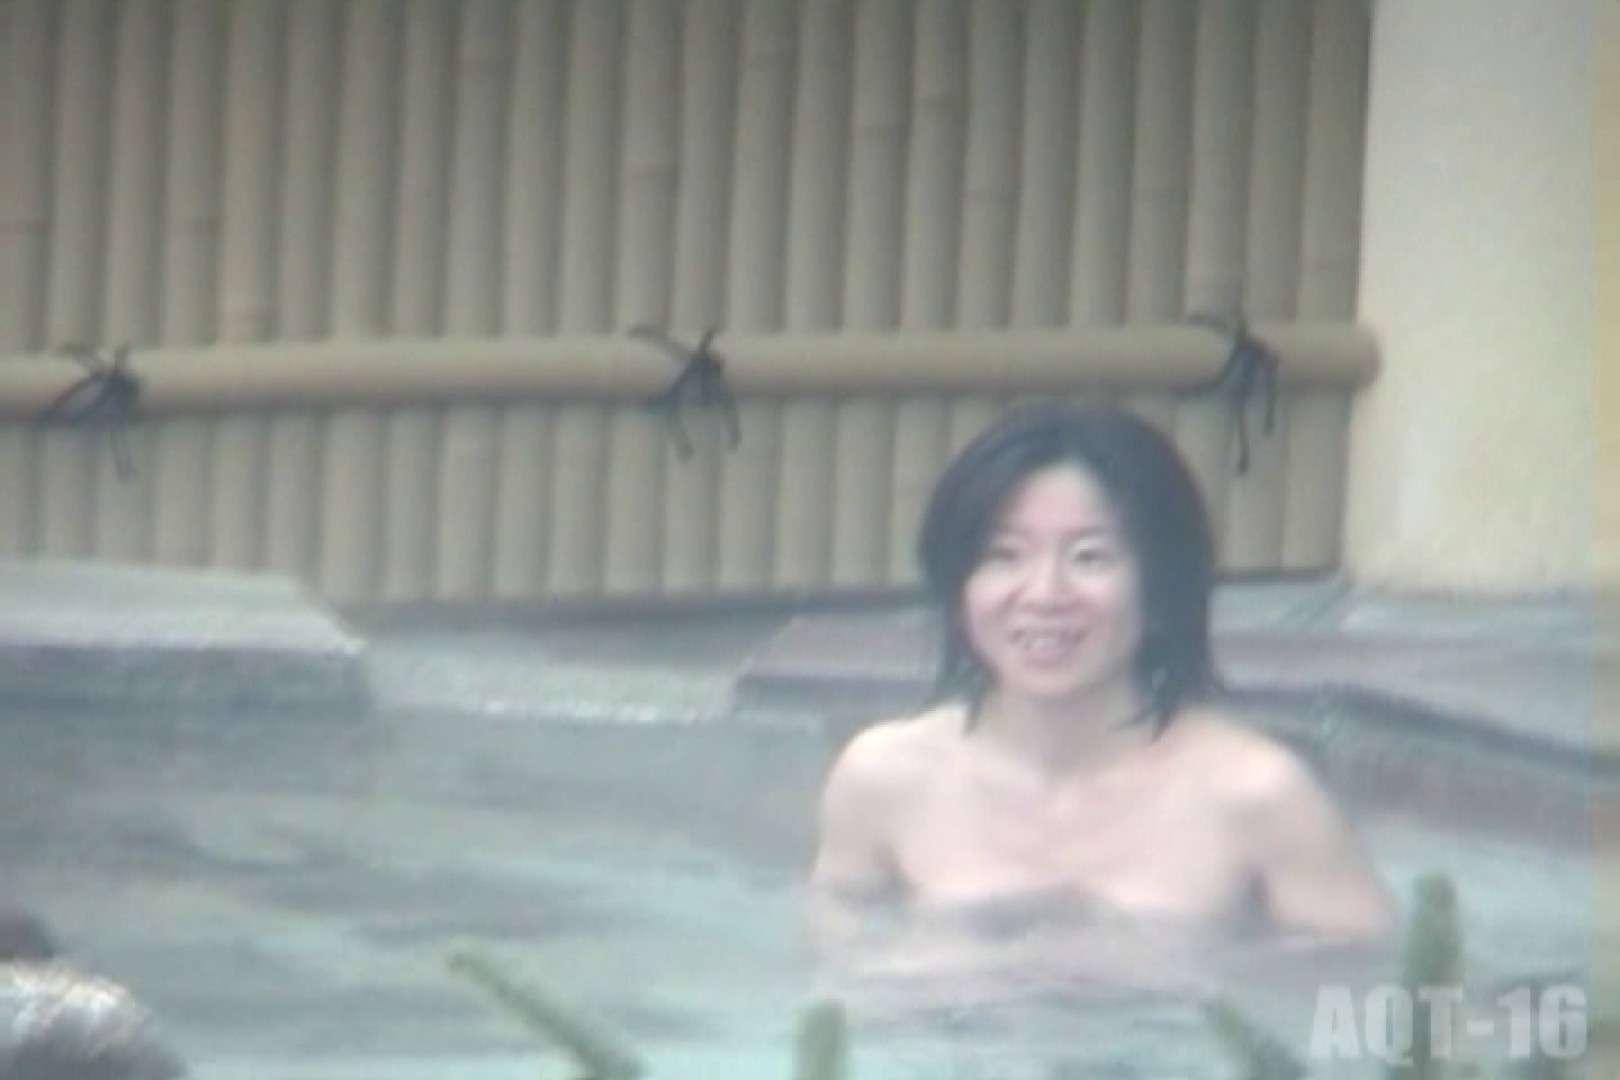 Aquaな露天風呂Vol.841 OLセックス 盗撮セックス無修正動画無料 56画像 44